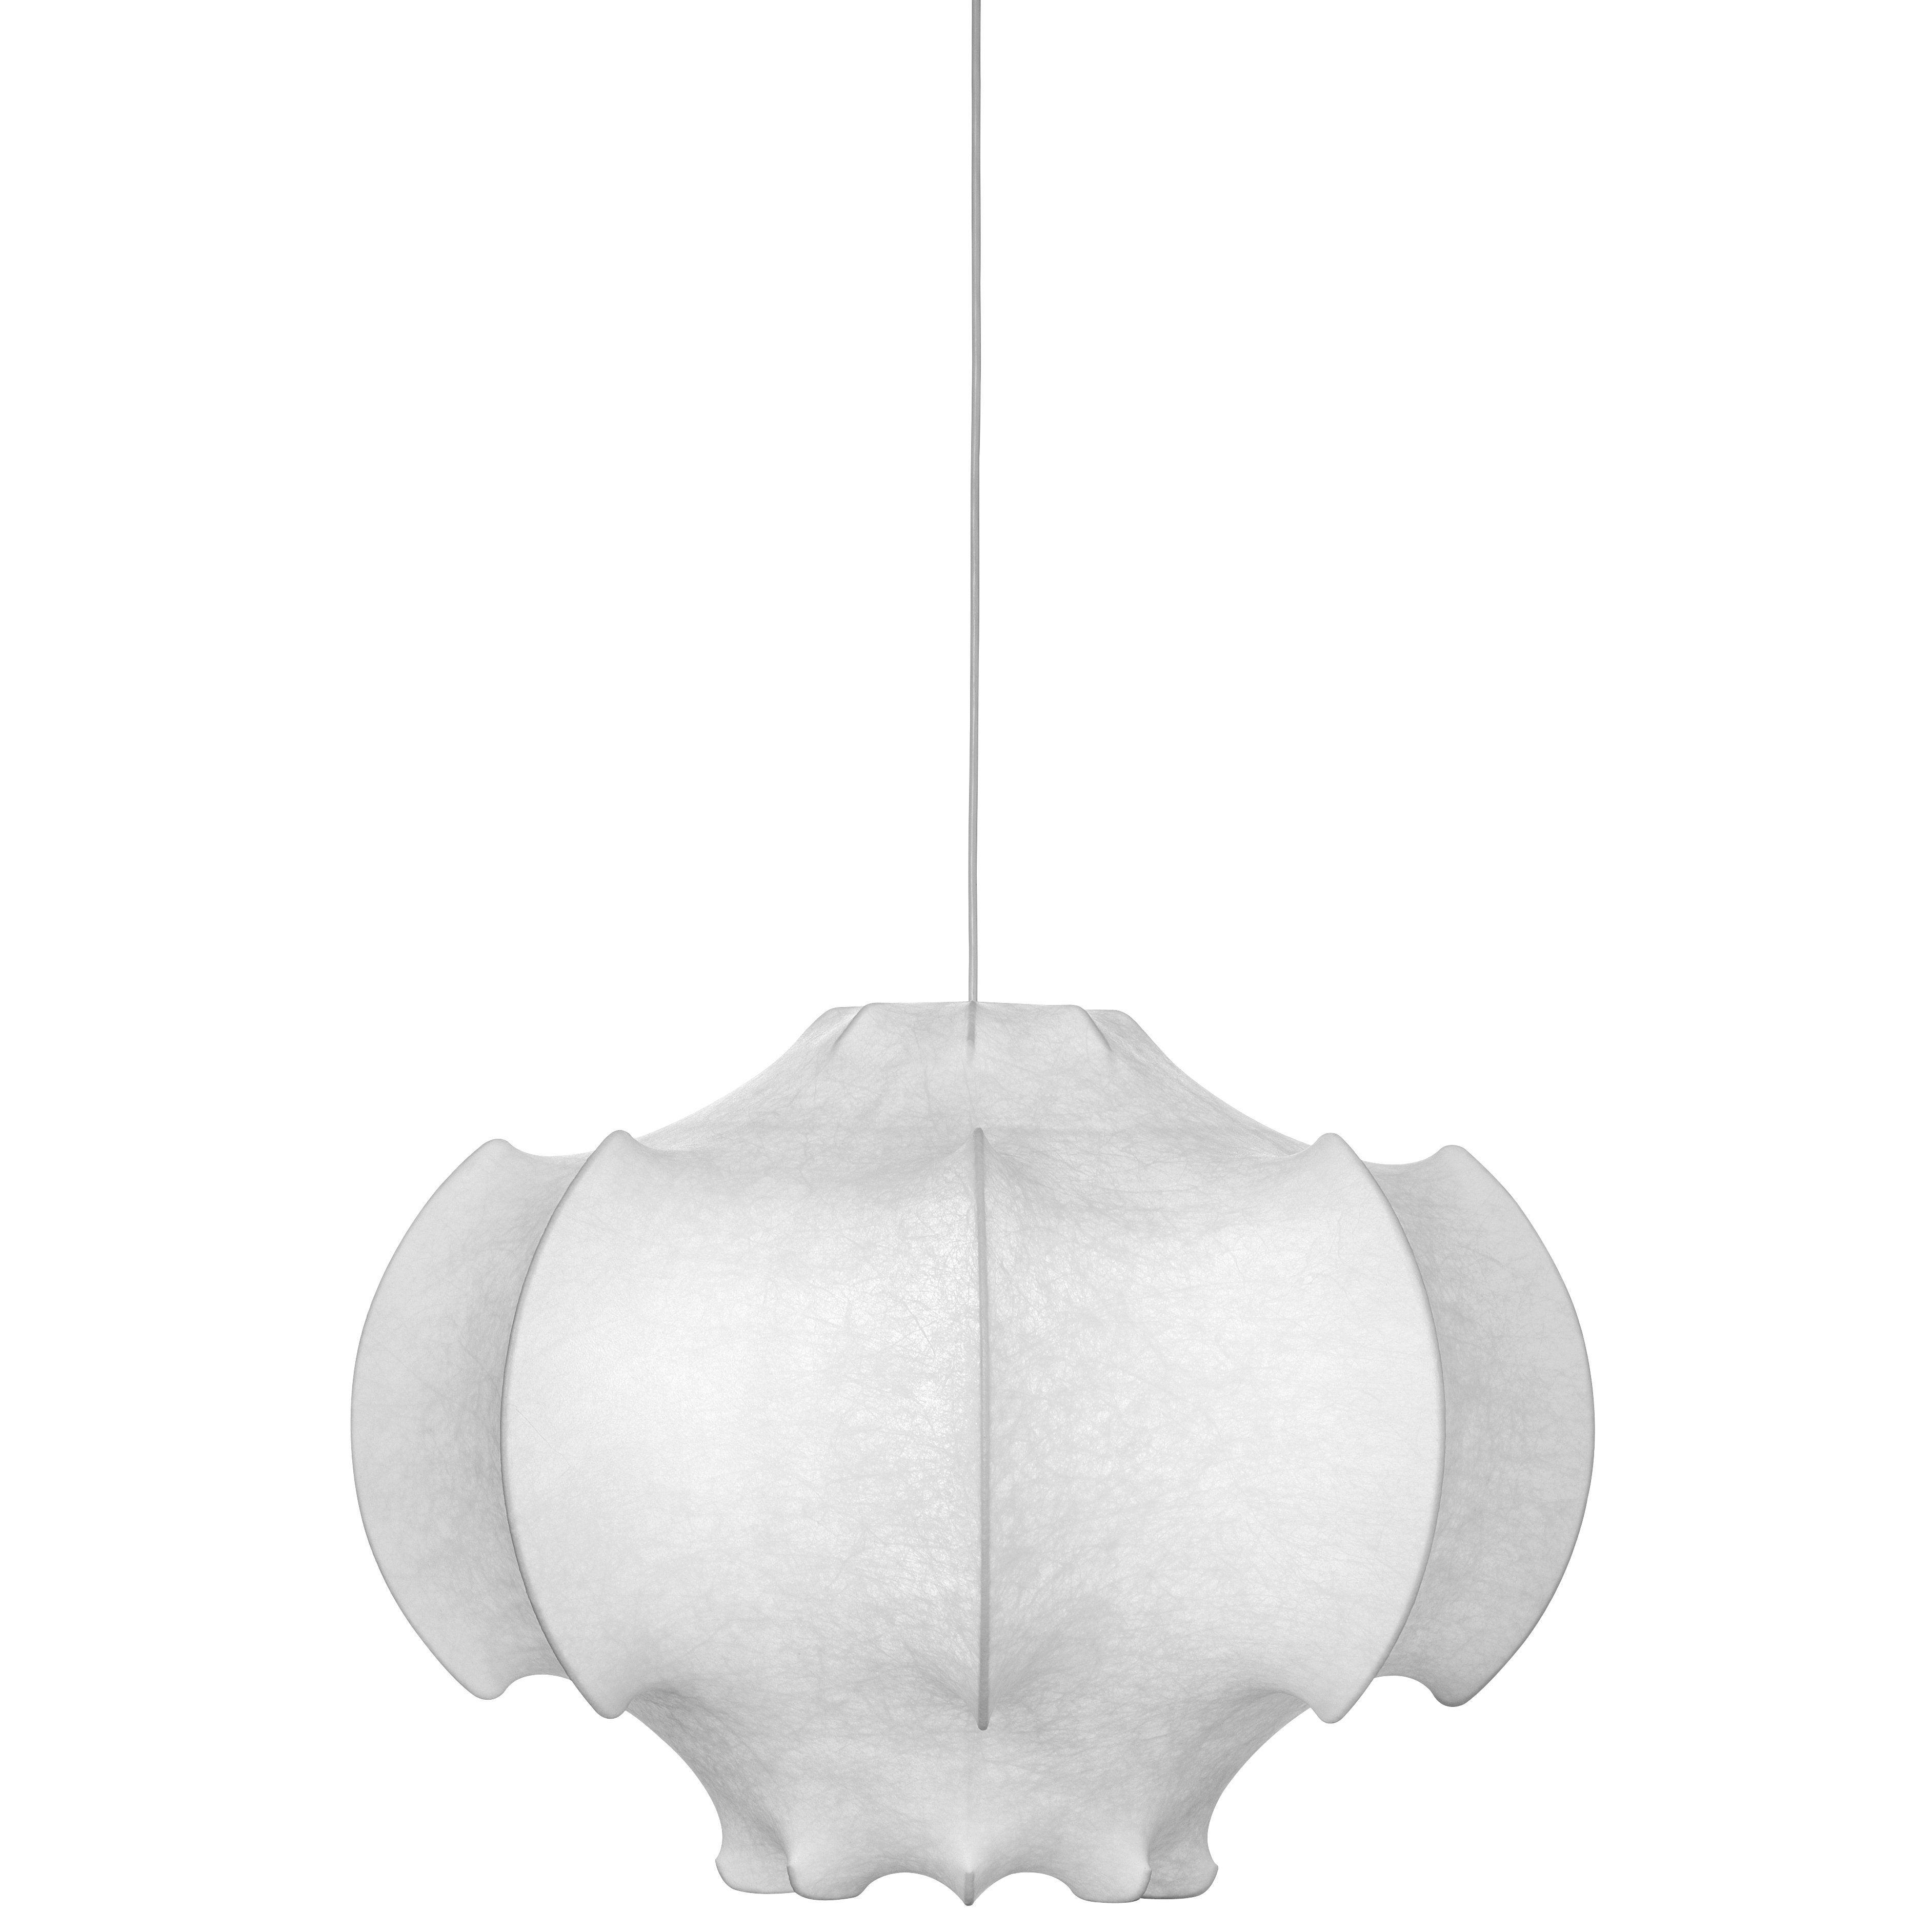 FLOS Viscontea Pendant Light by Achille & Pier Giacomo Castiglioni